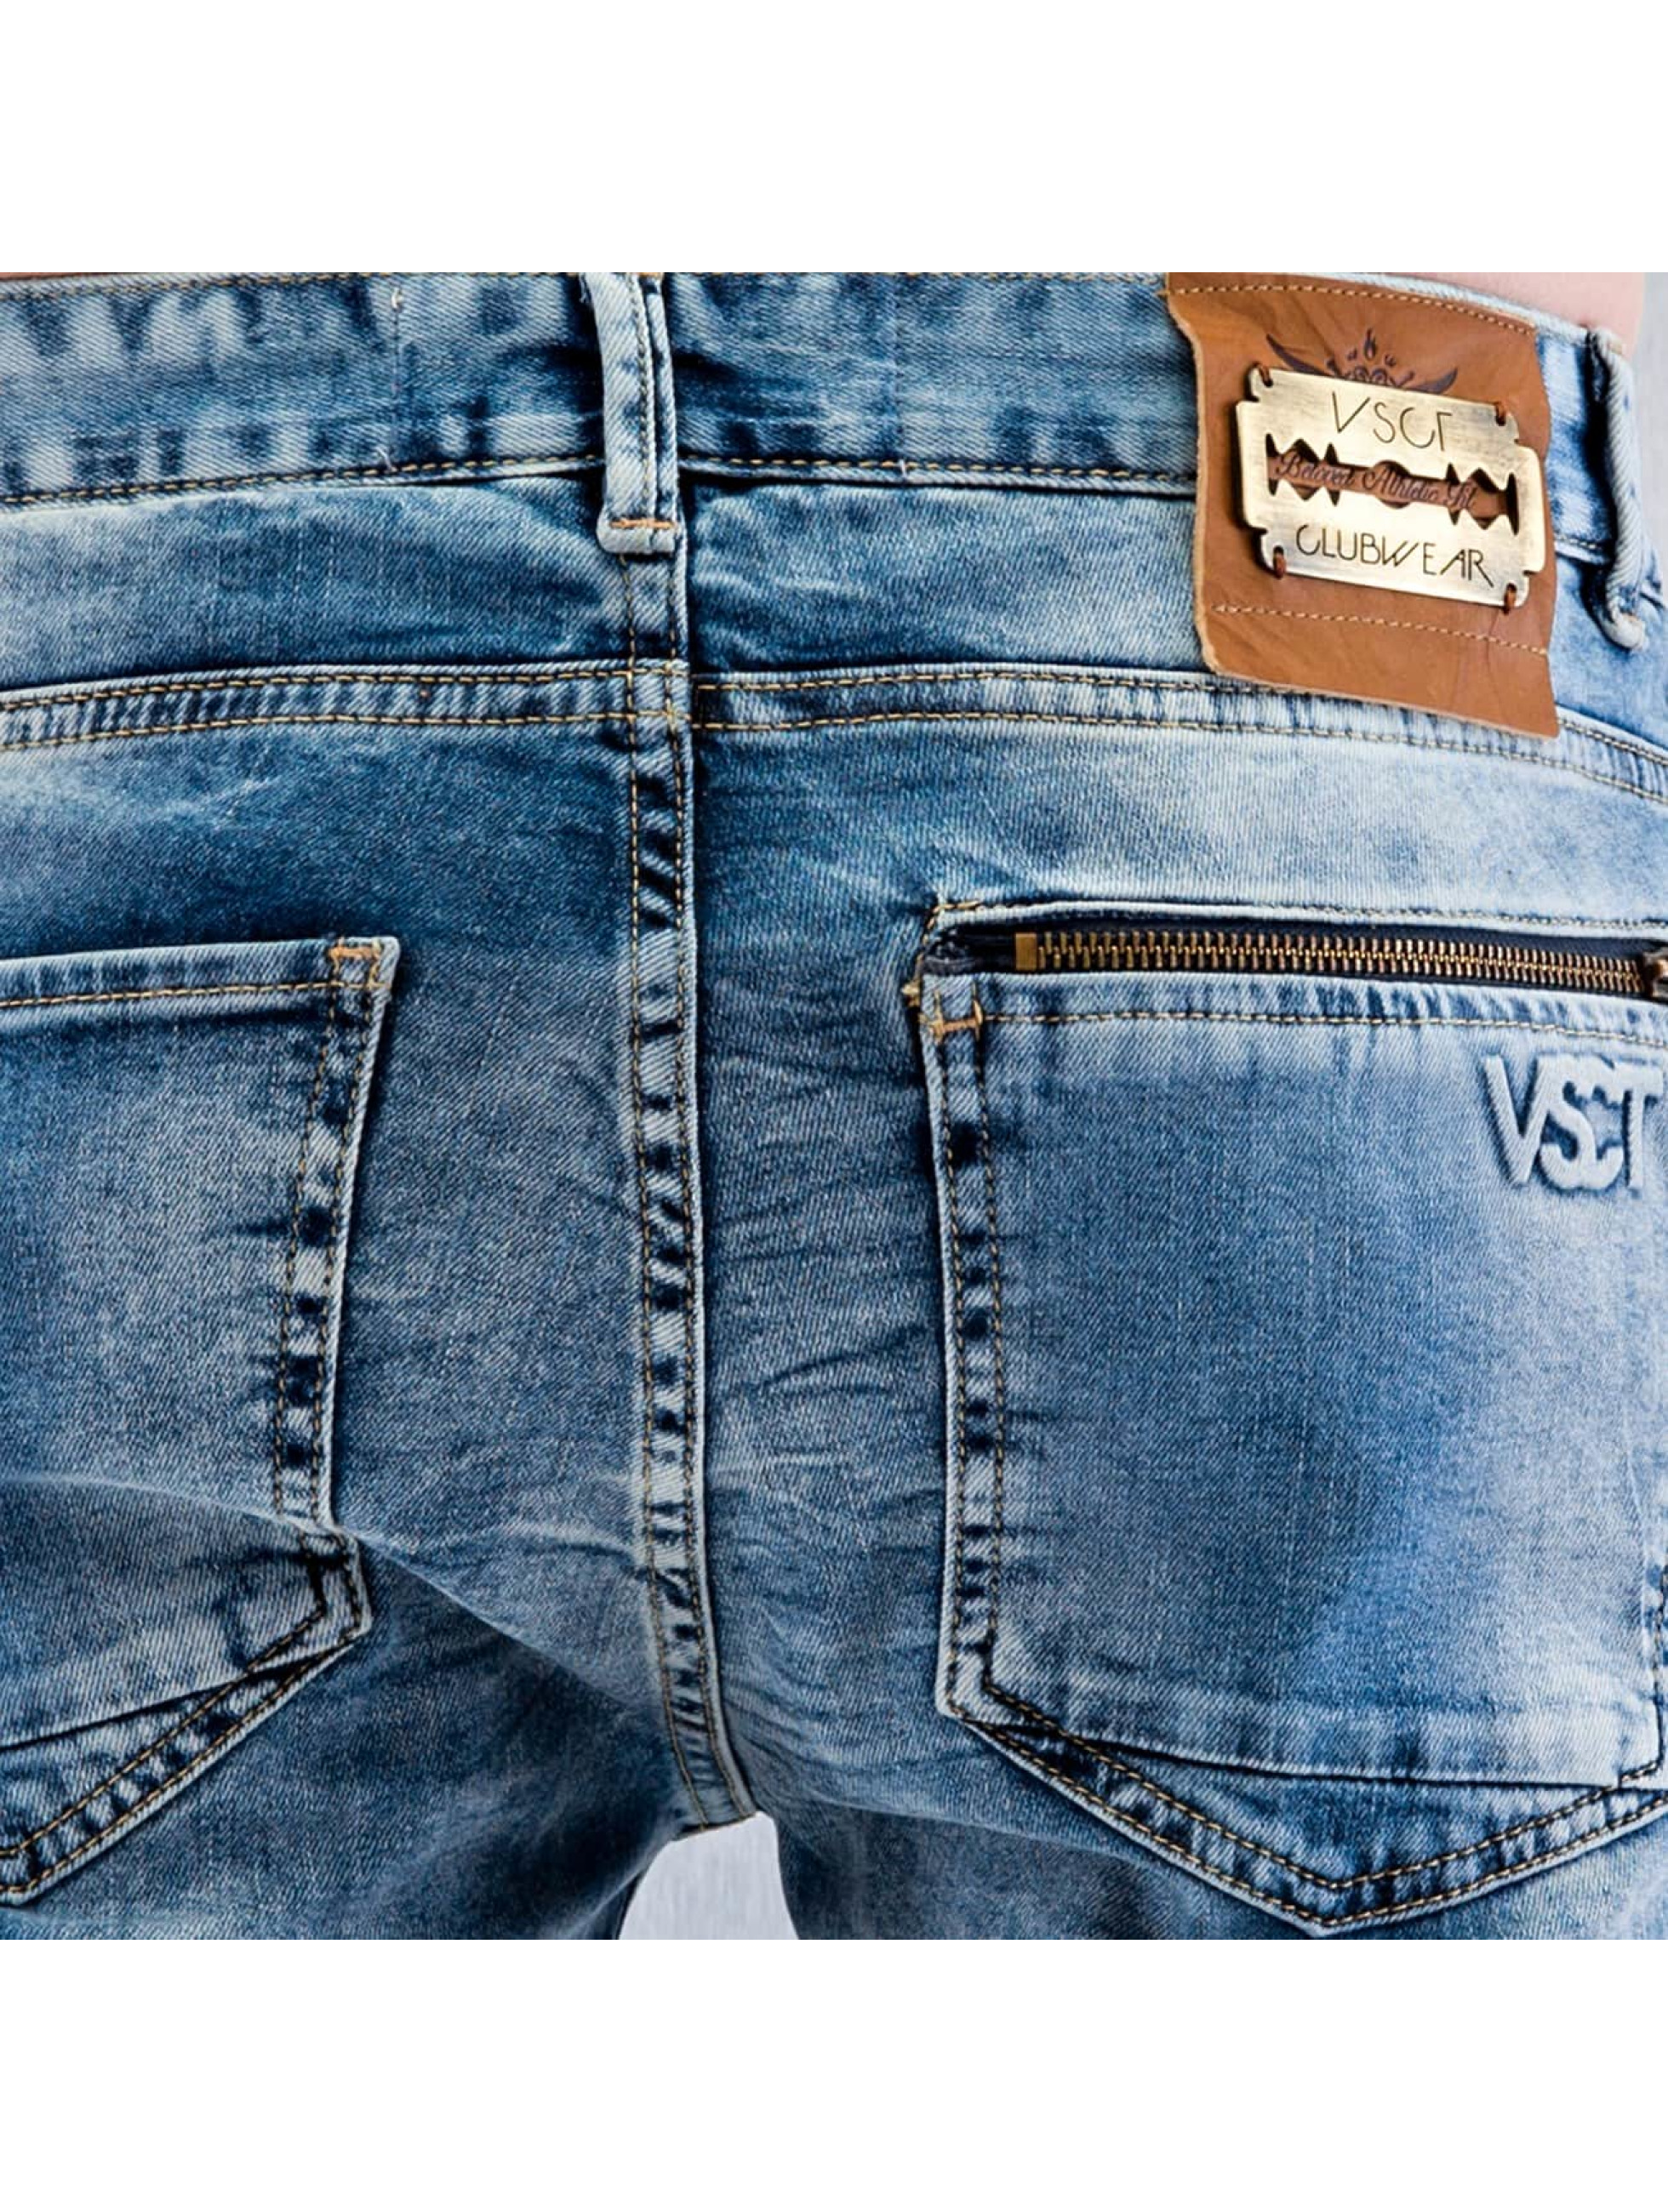 VSCT Clubwear Облегающие джинсы Lazer Racer синий